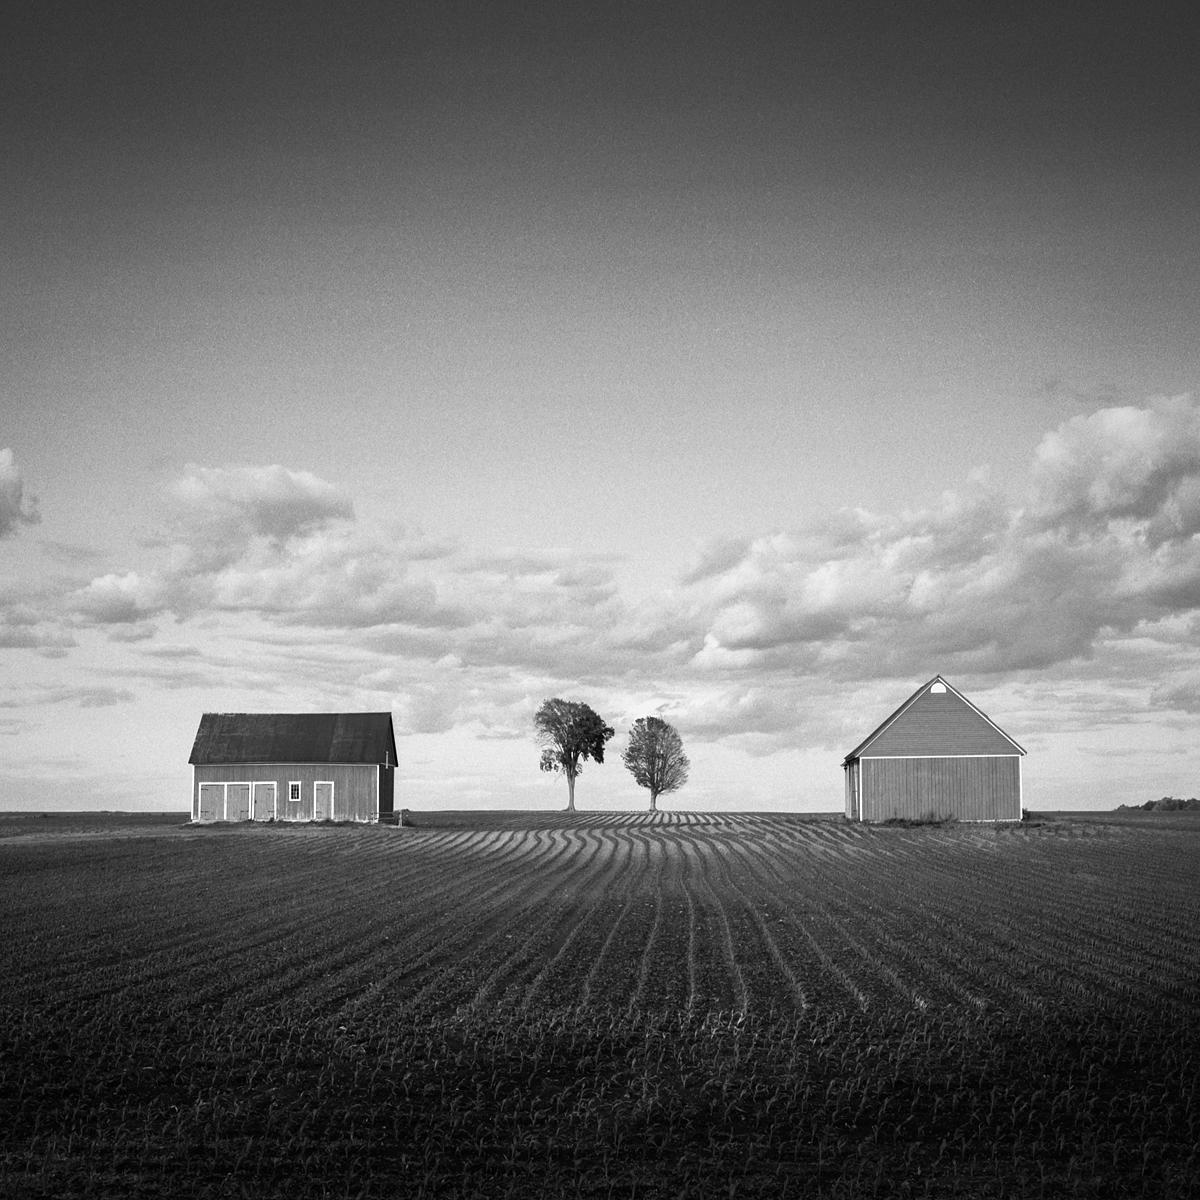 Barns & Trees